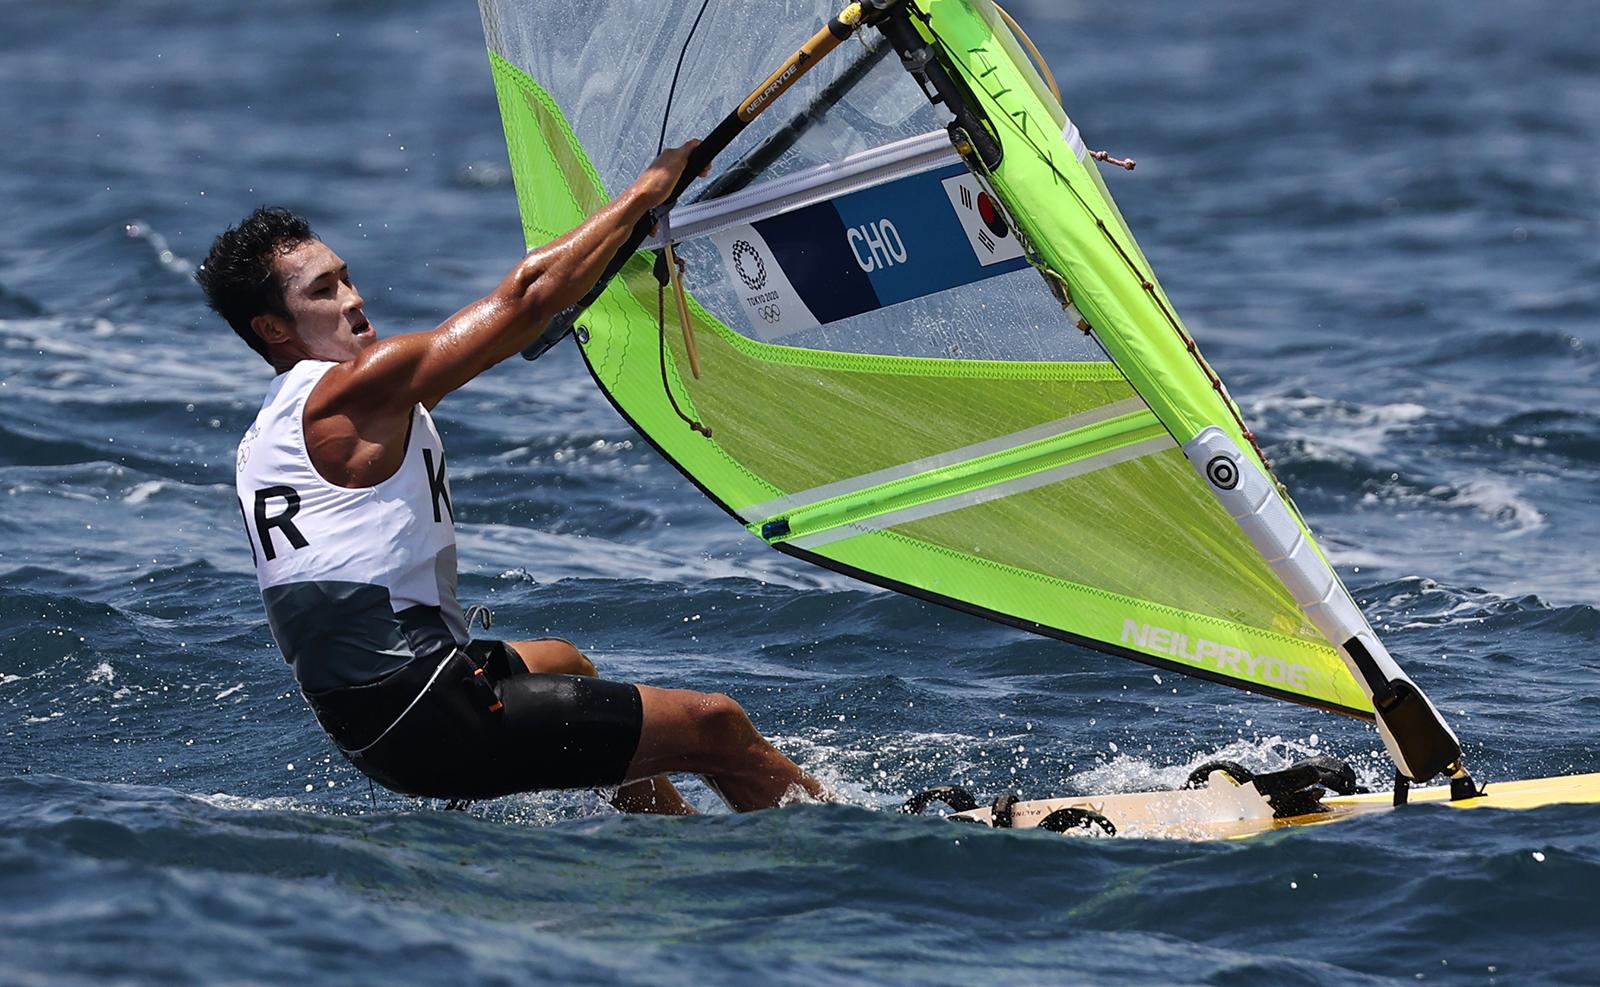 Tokyo 2020 Olympics - Sailing - Men's RS:X - Opening Series - Enoshima Yacht Harbour - Tokyo, Japan - July 28, 2021. Cho Won-woo of South Korea prepares before competing. REUTERS